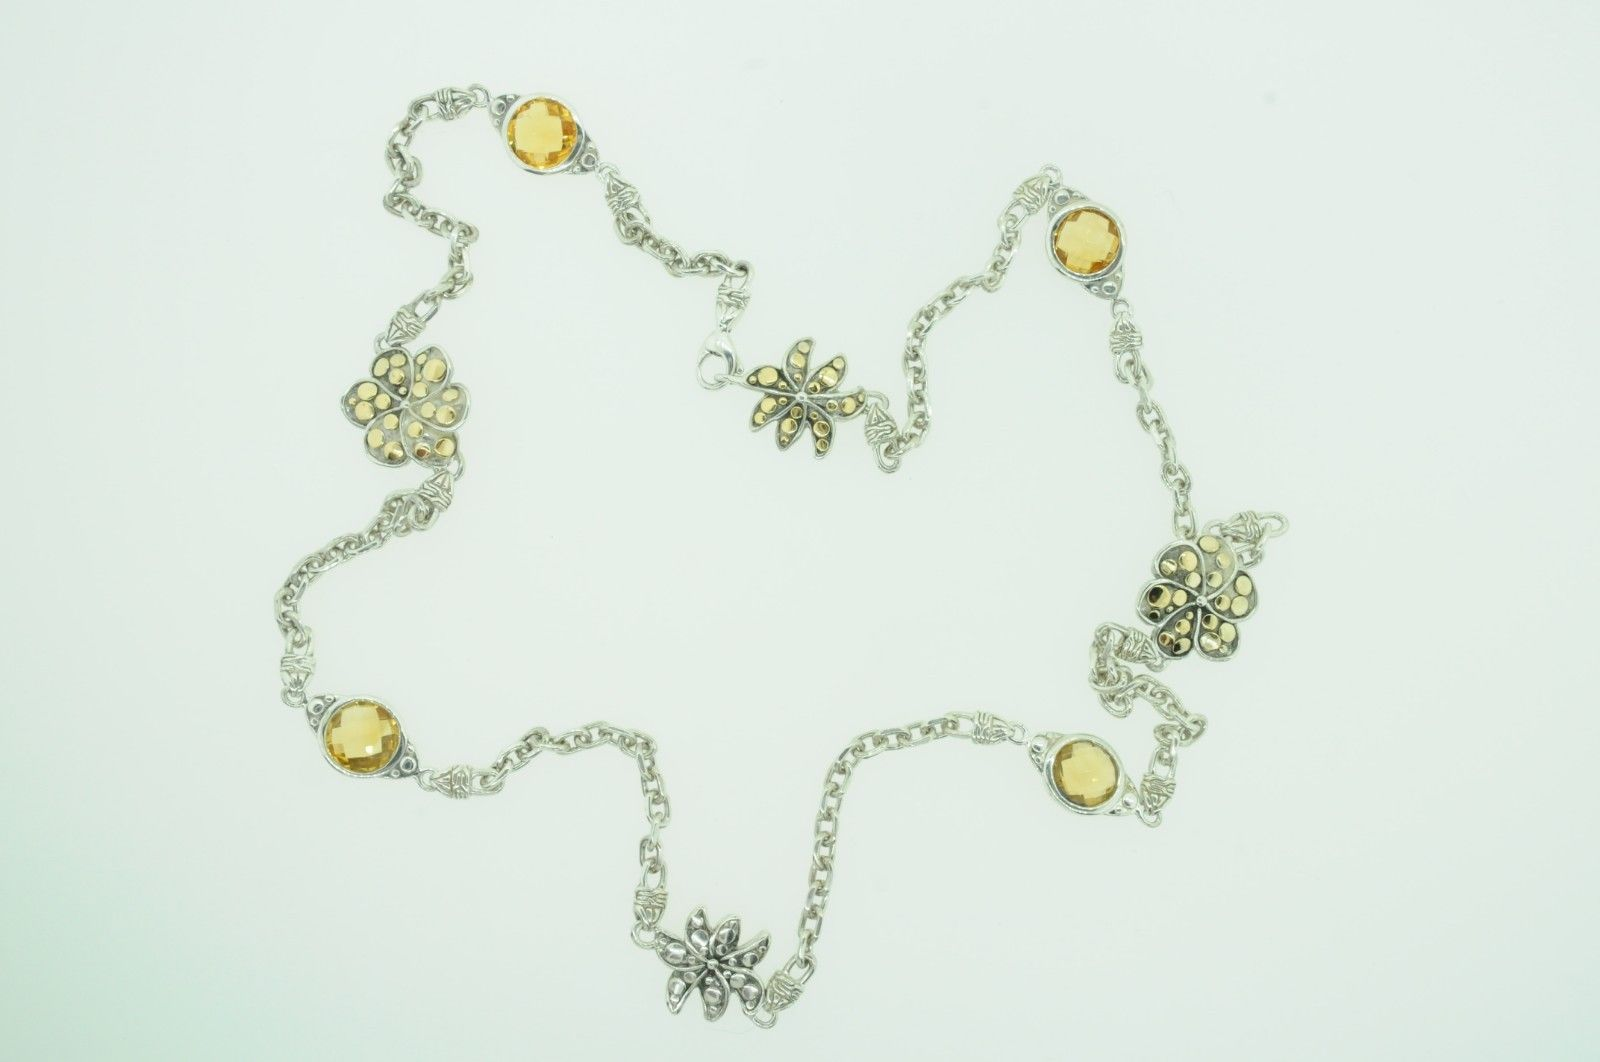 "JOHN HARDY Sterling Silver 18K Yellow Gold Ayu Frangipani Citrine Necklace (24"") image 2"